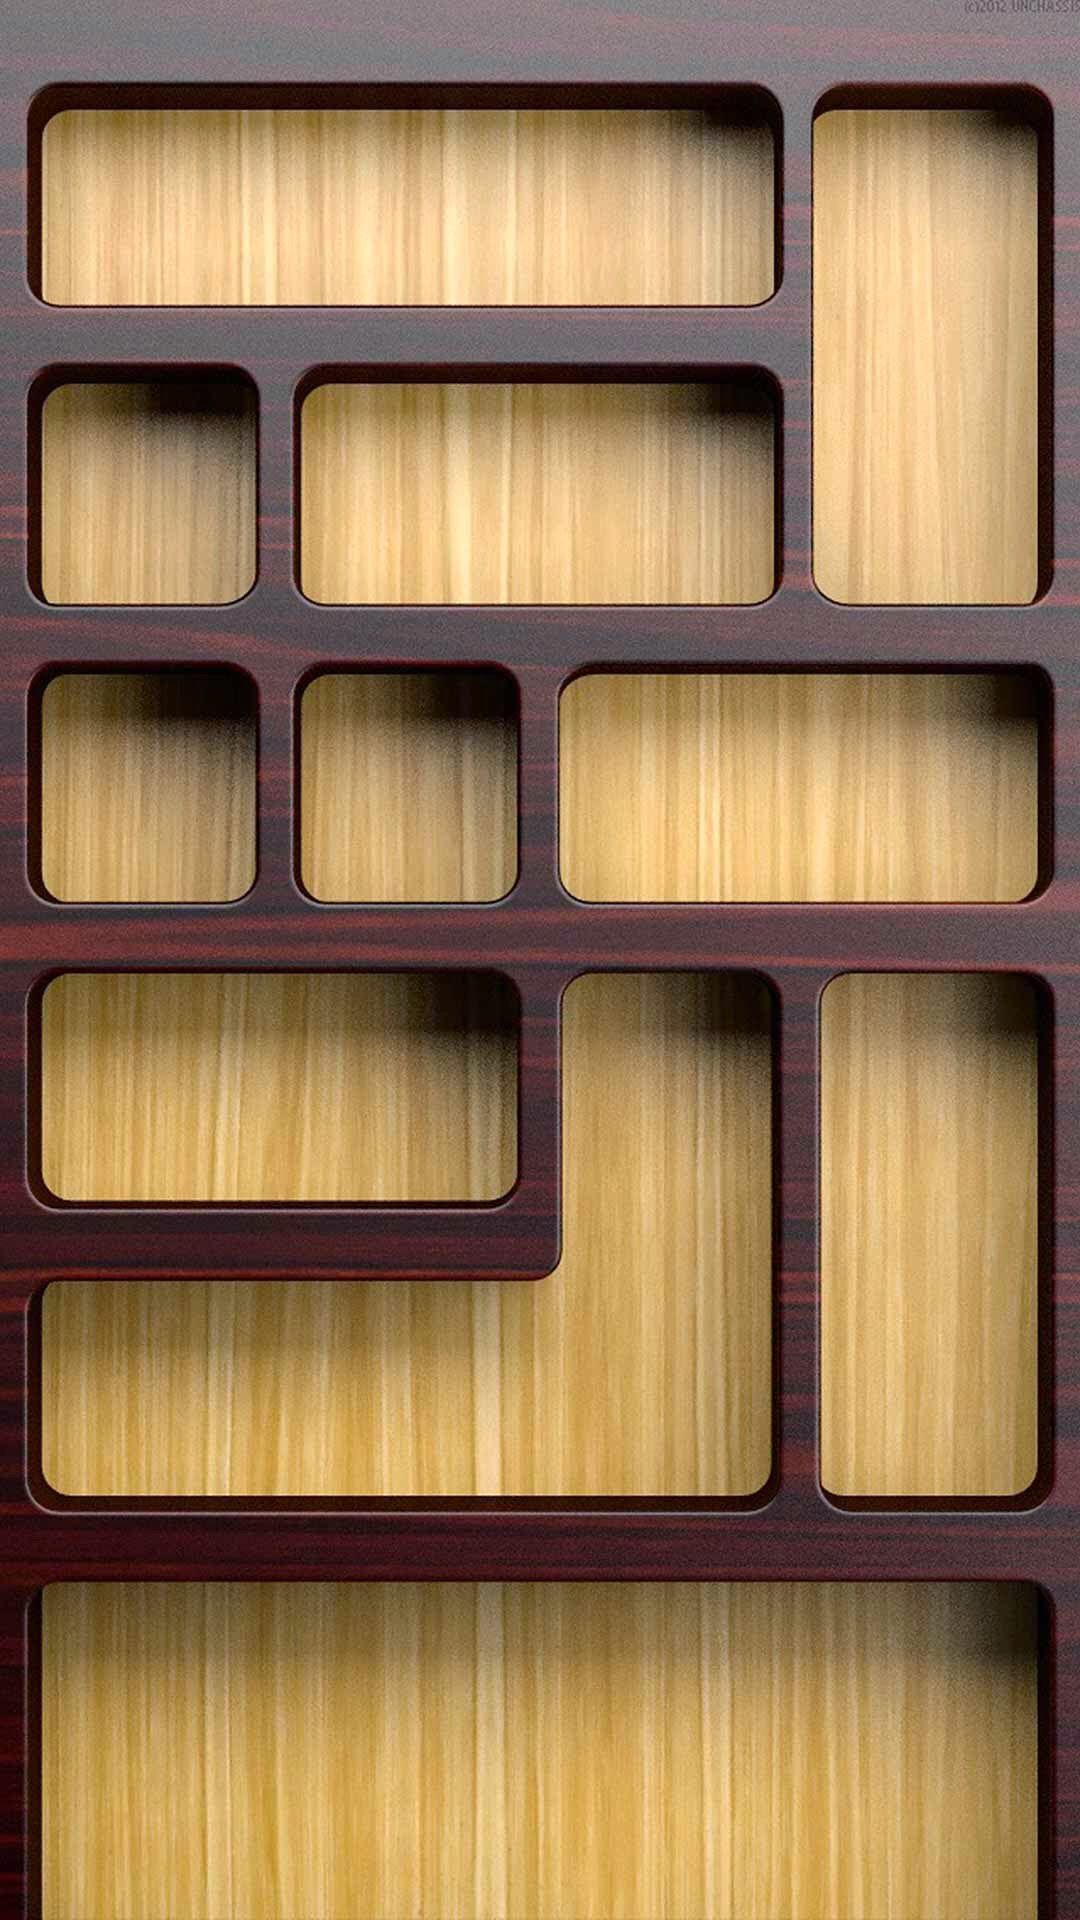 iphone 5 home wallpaper shelfshelves